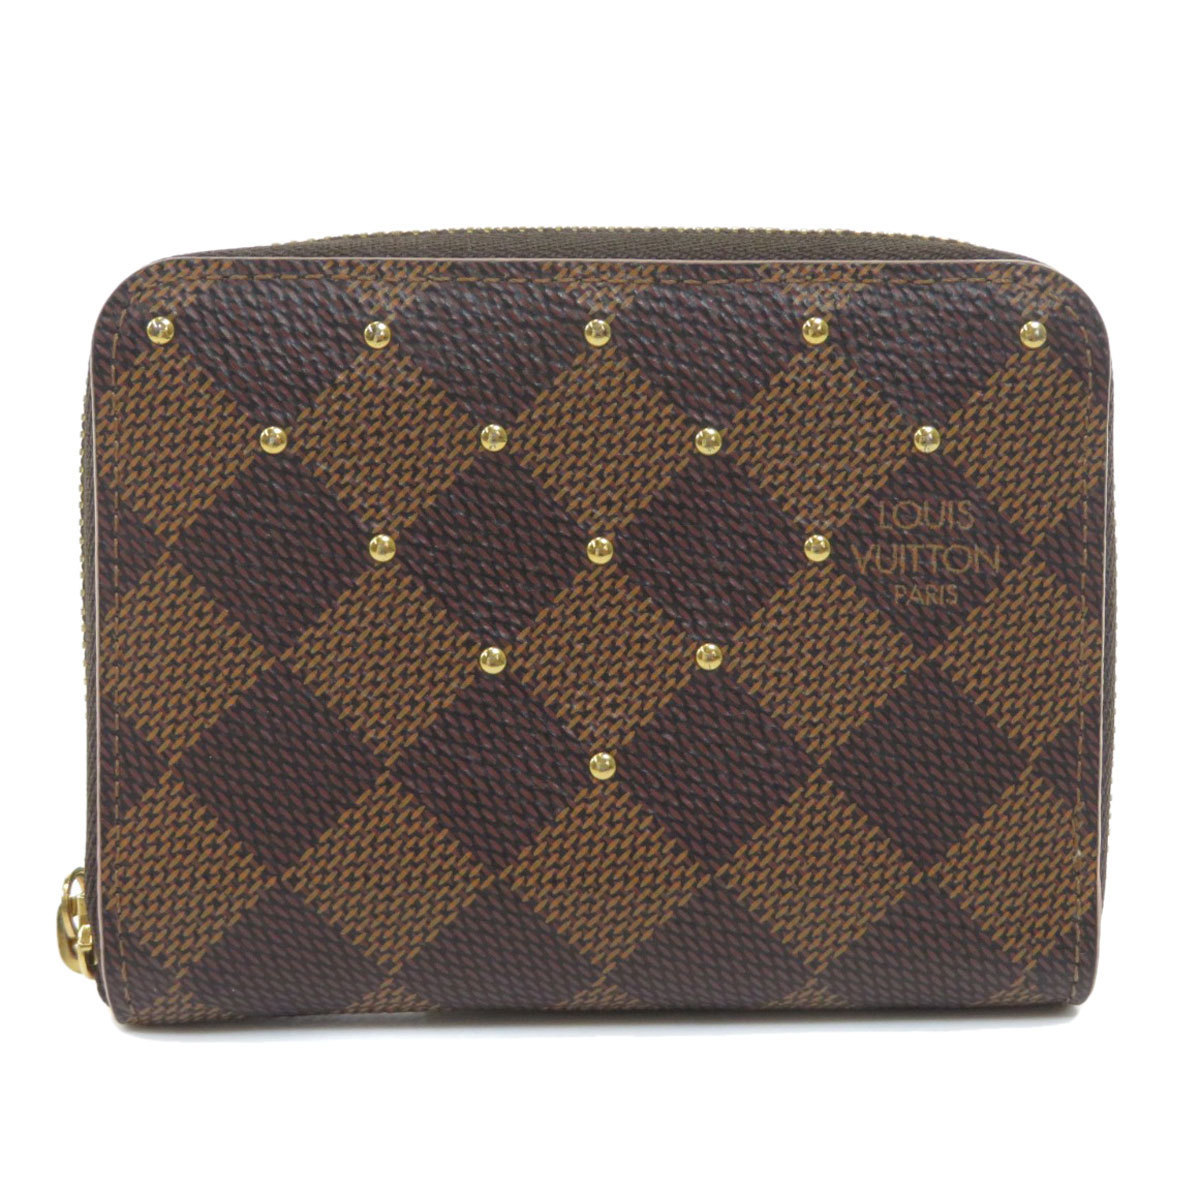 Louis Vuitton N60250 Zippy Coin Purse Studs Damier Ebene Case Canvas Ladies